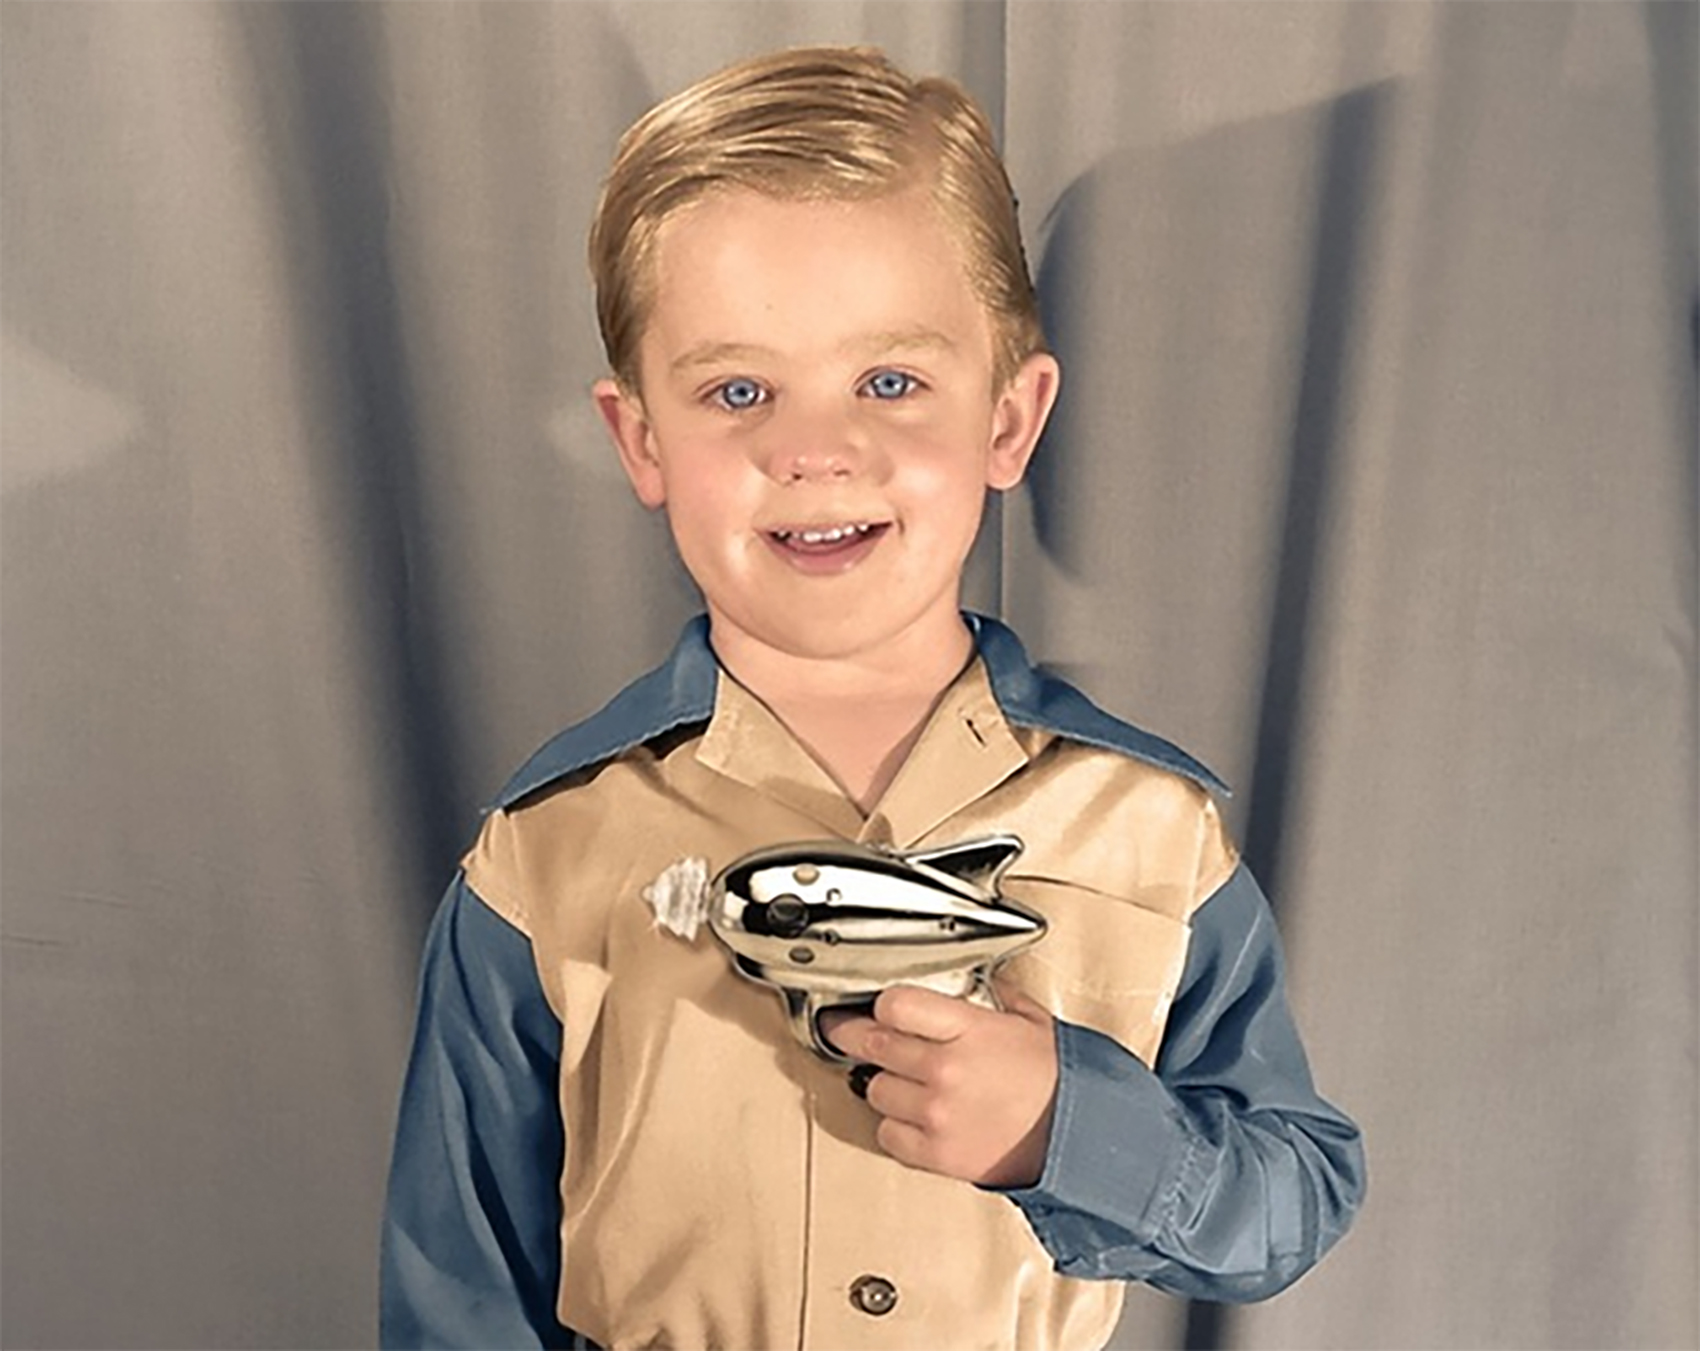 raygun kid 1700